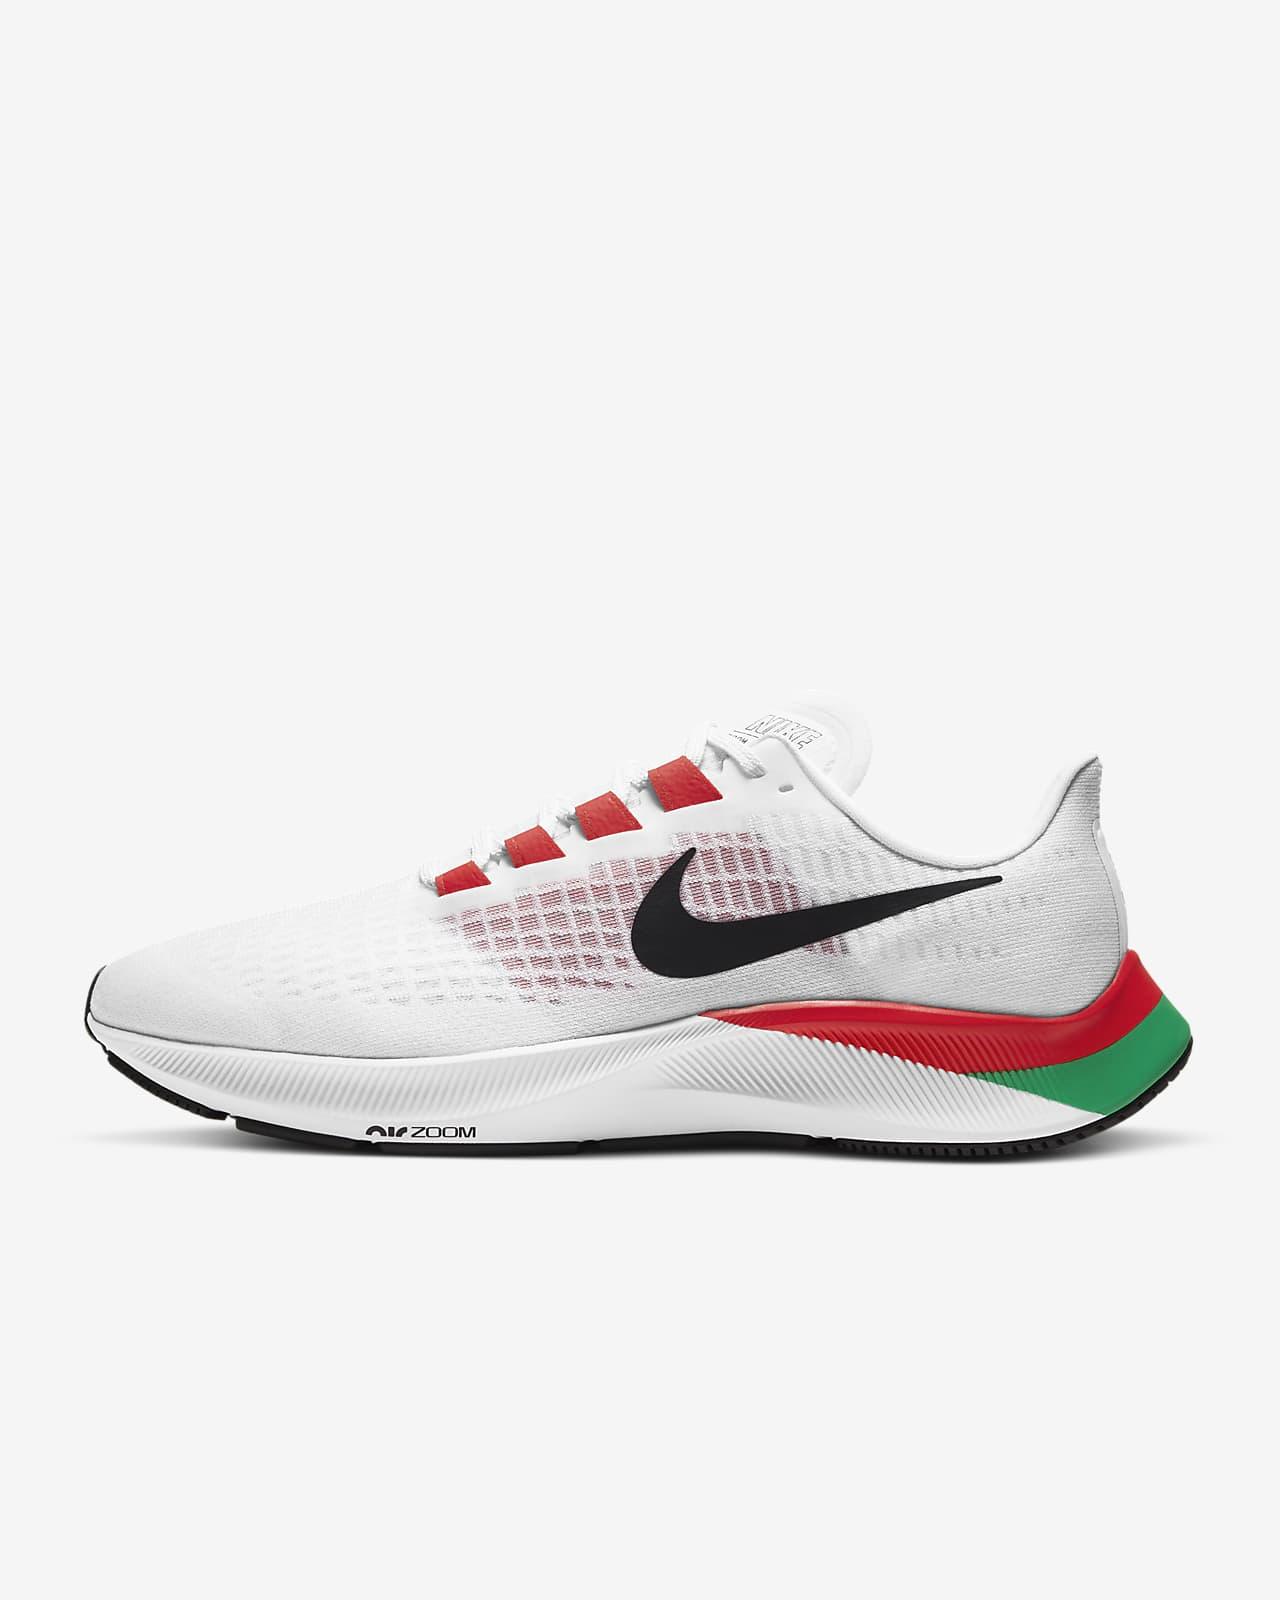 Scarpa da running Nike Air Zoom Pegasus 37 Eliud Kipchoge - Uomo